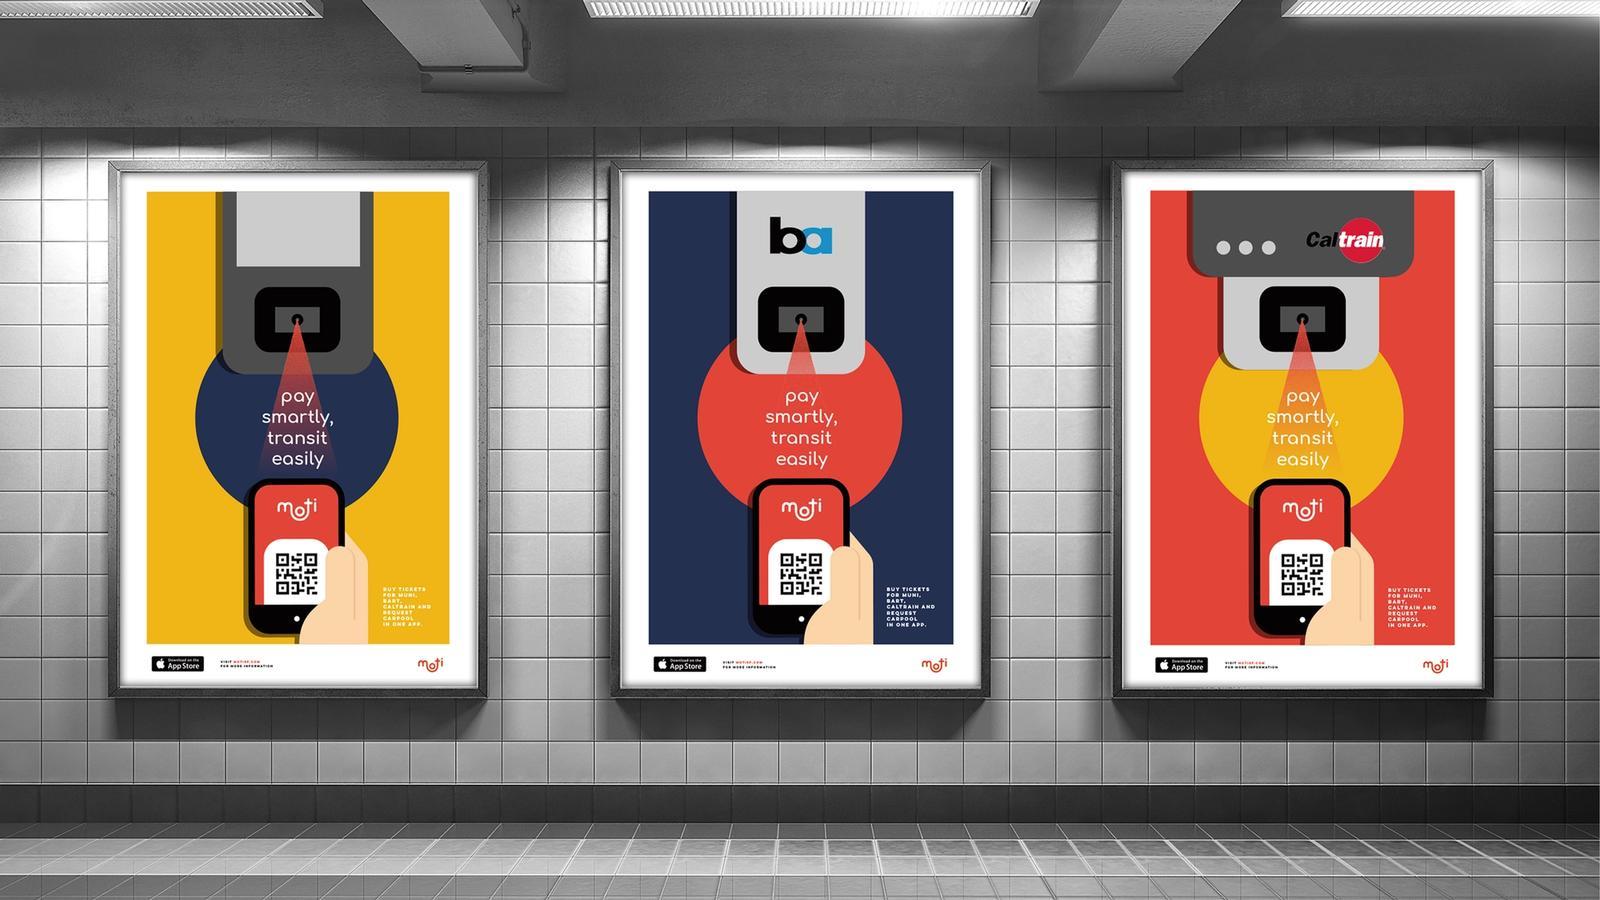 Moti Transit App Station Advertising // MFA Thesis Project